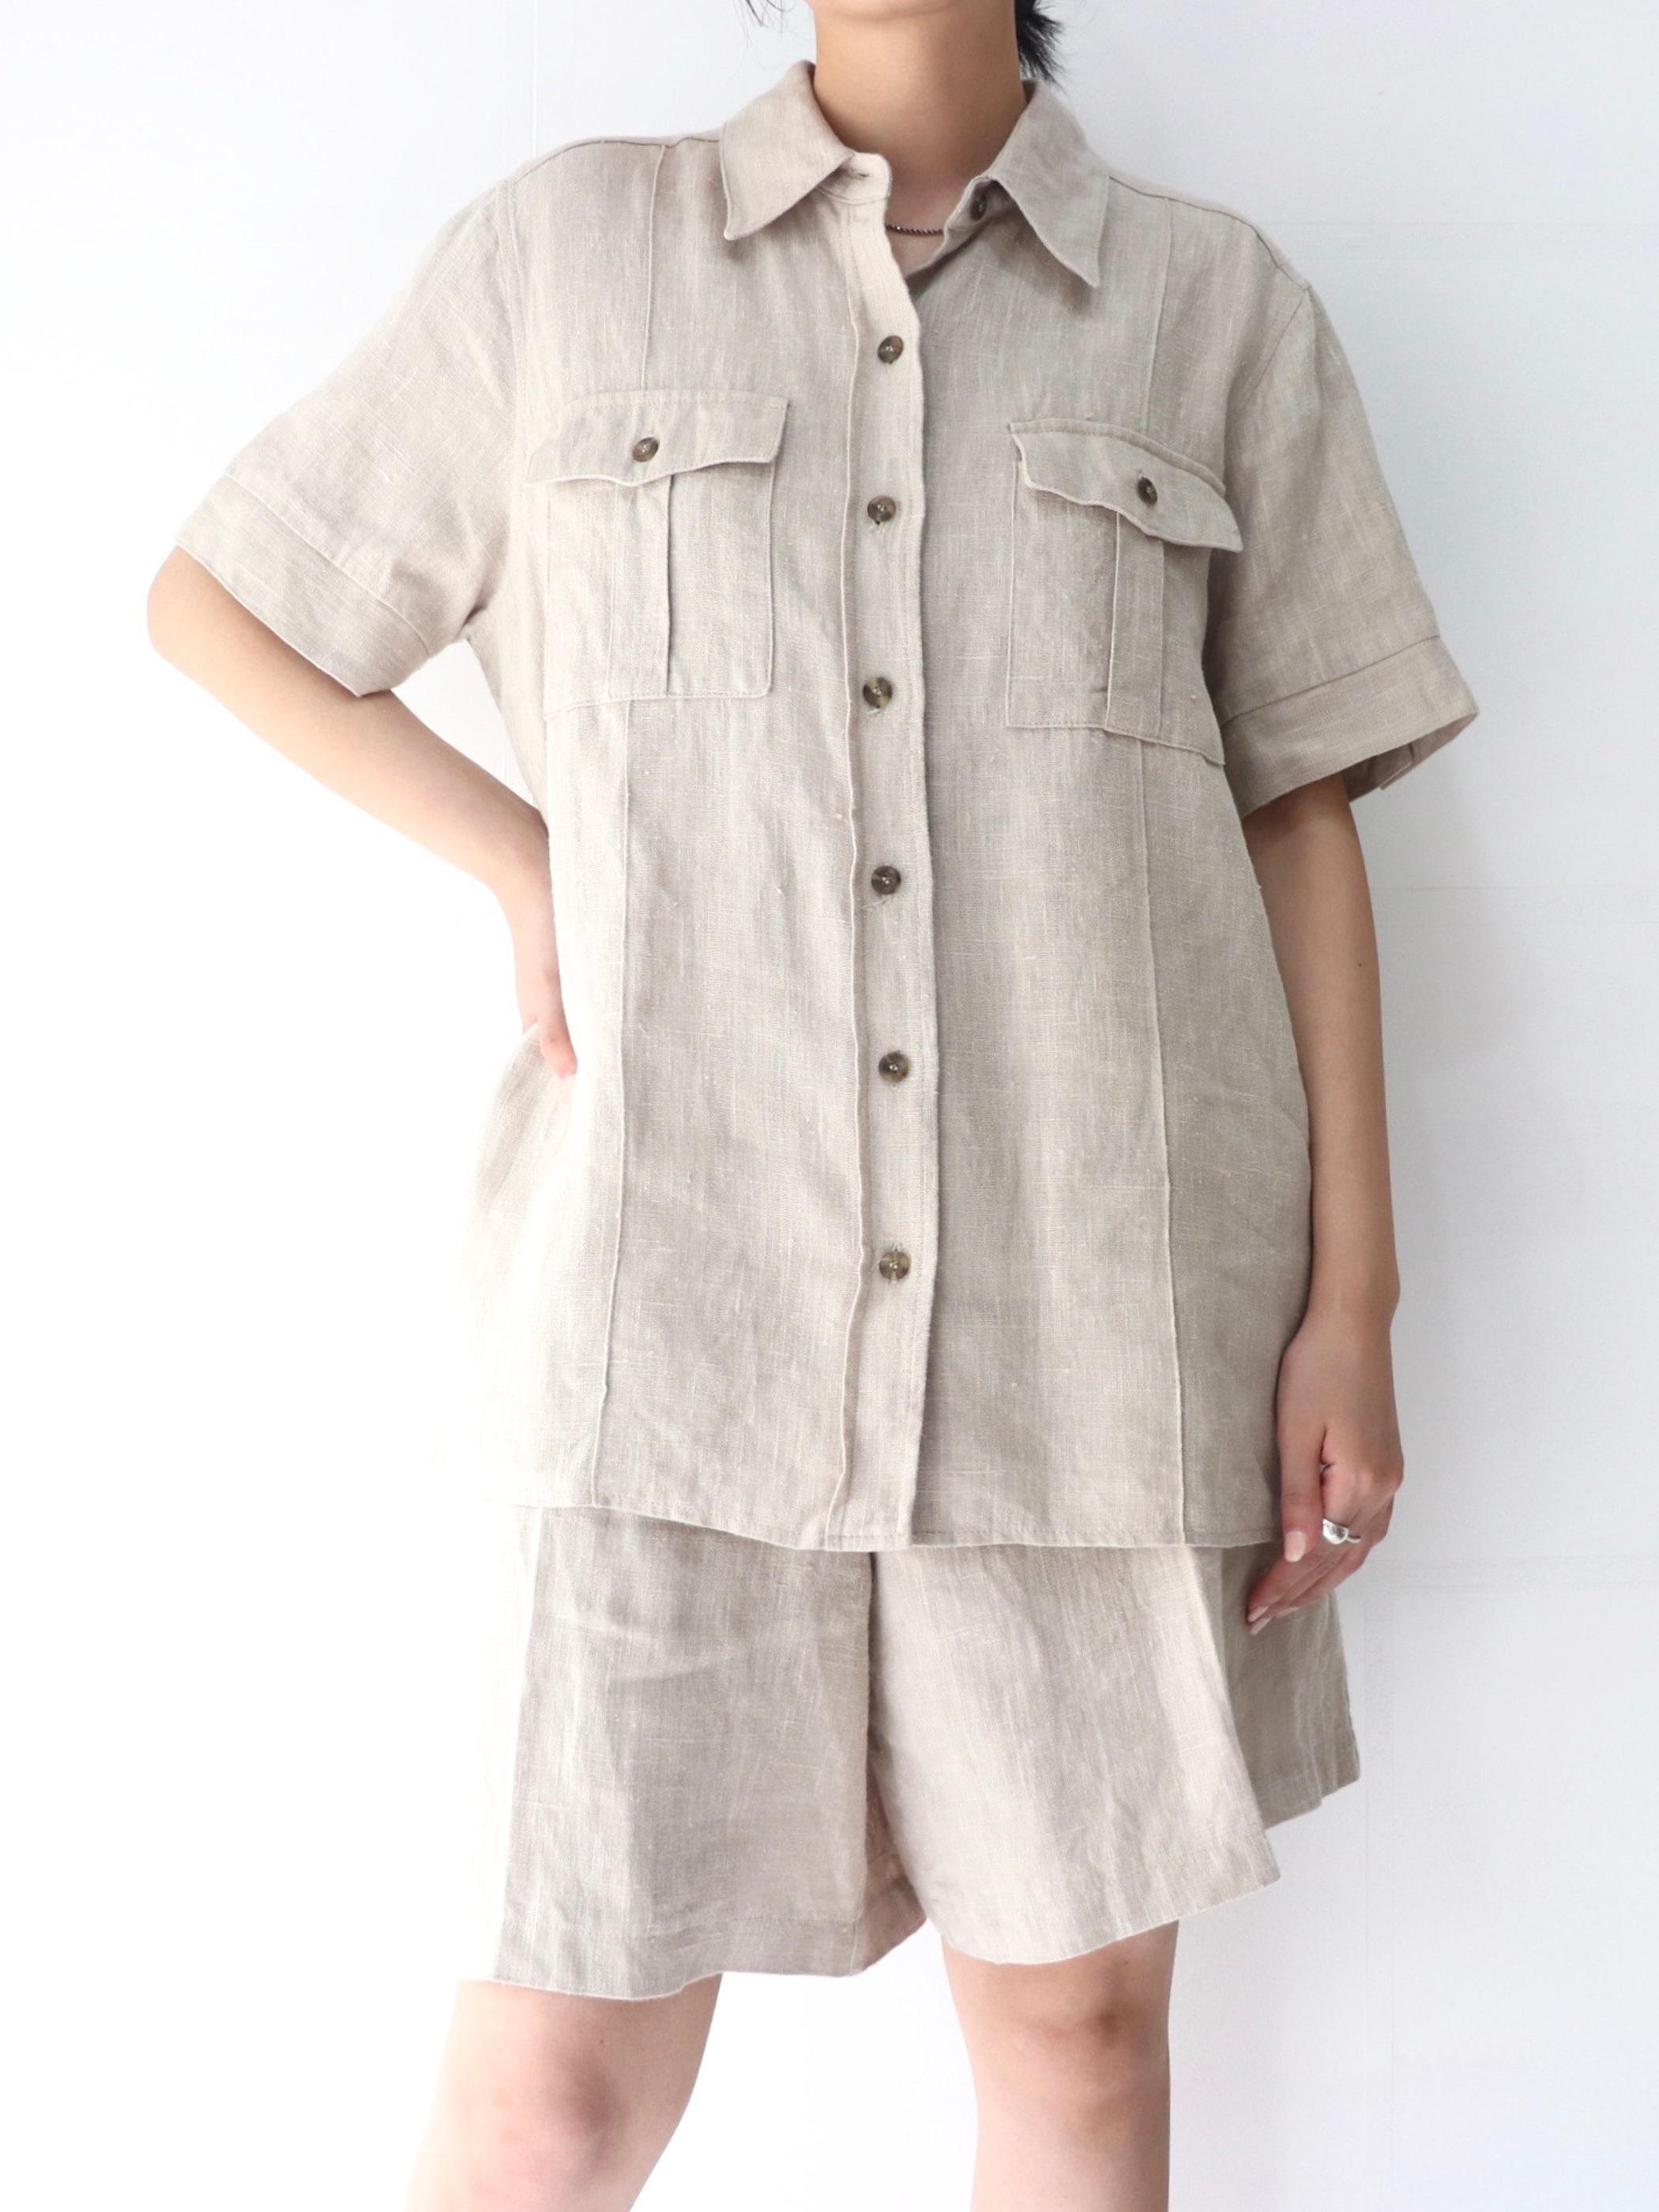 Linen S/S shirt & shorts setup